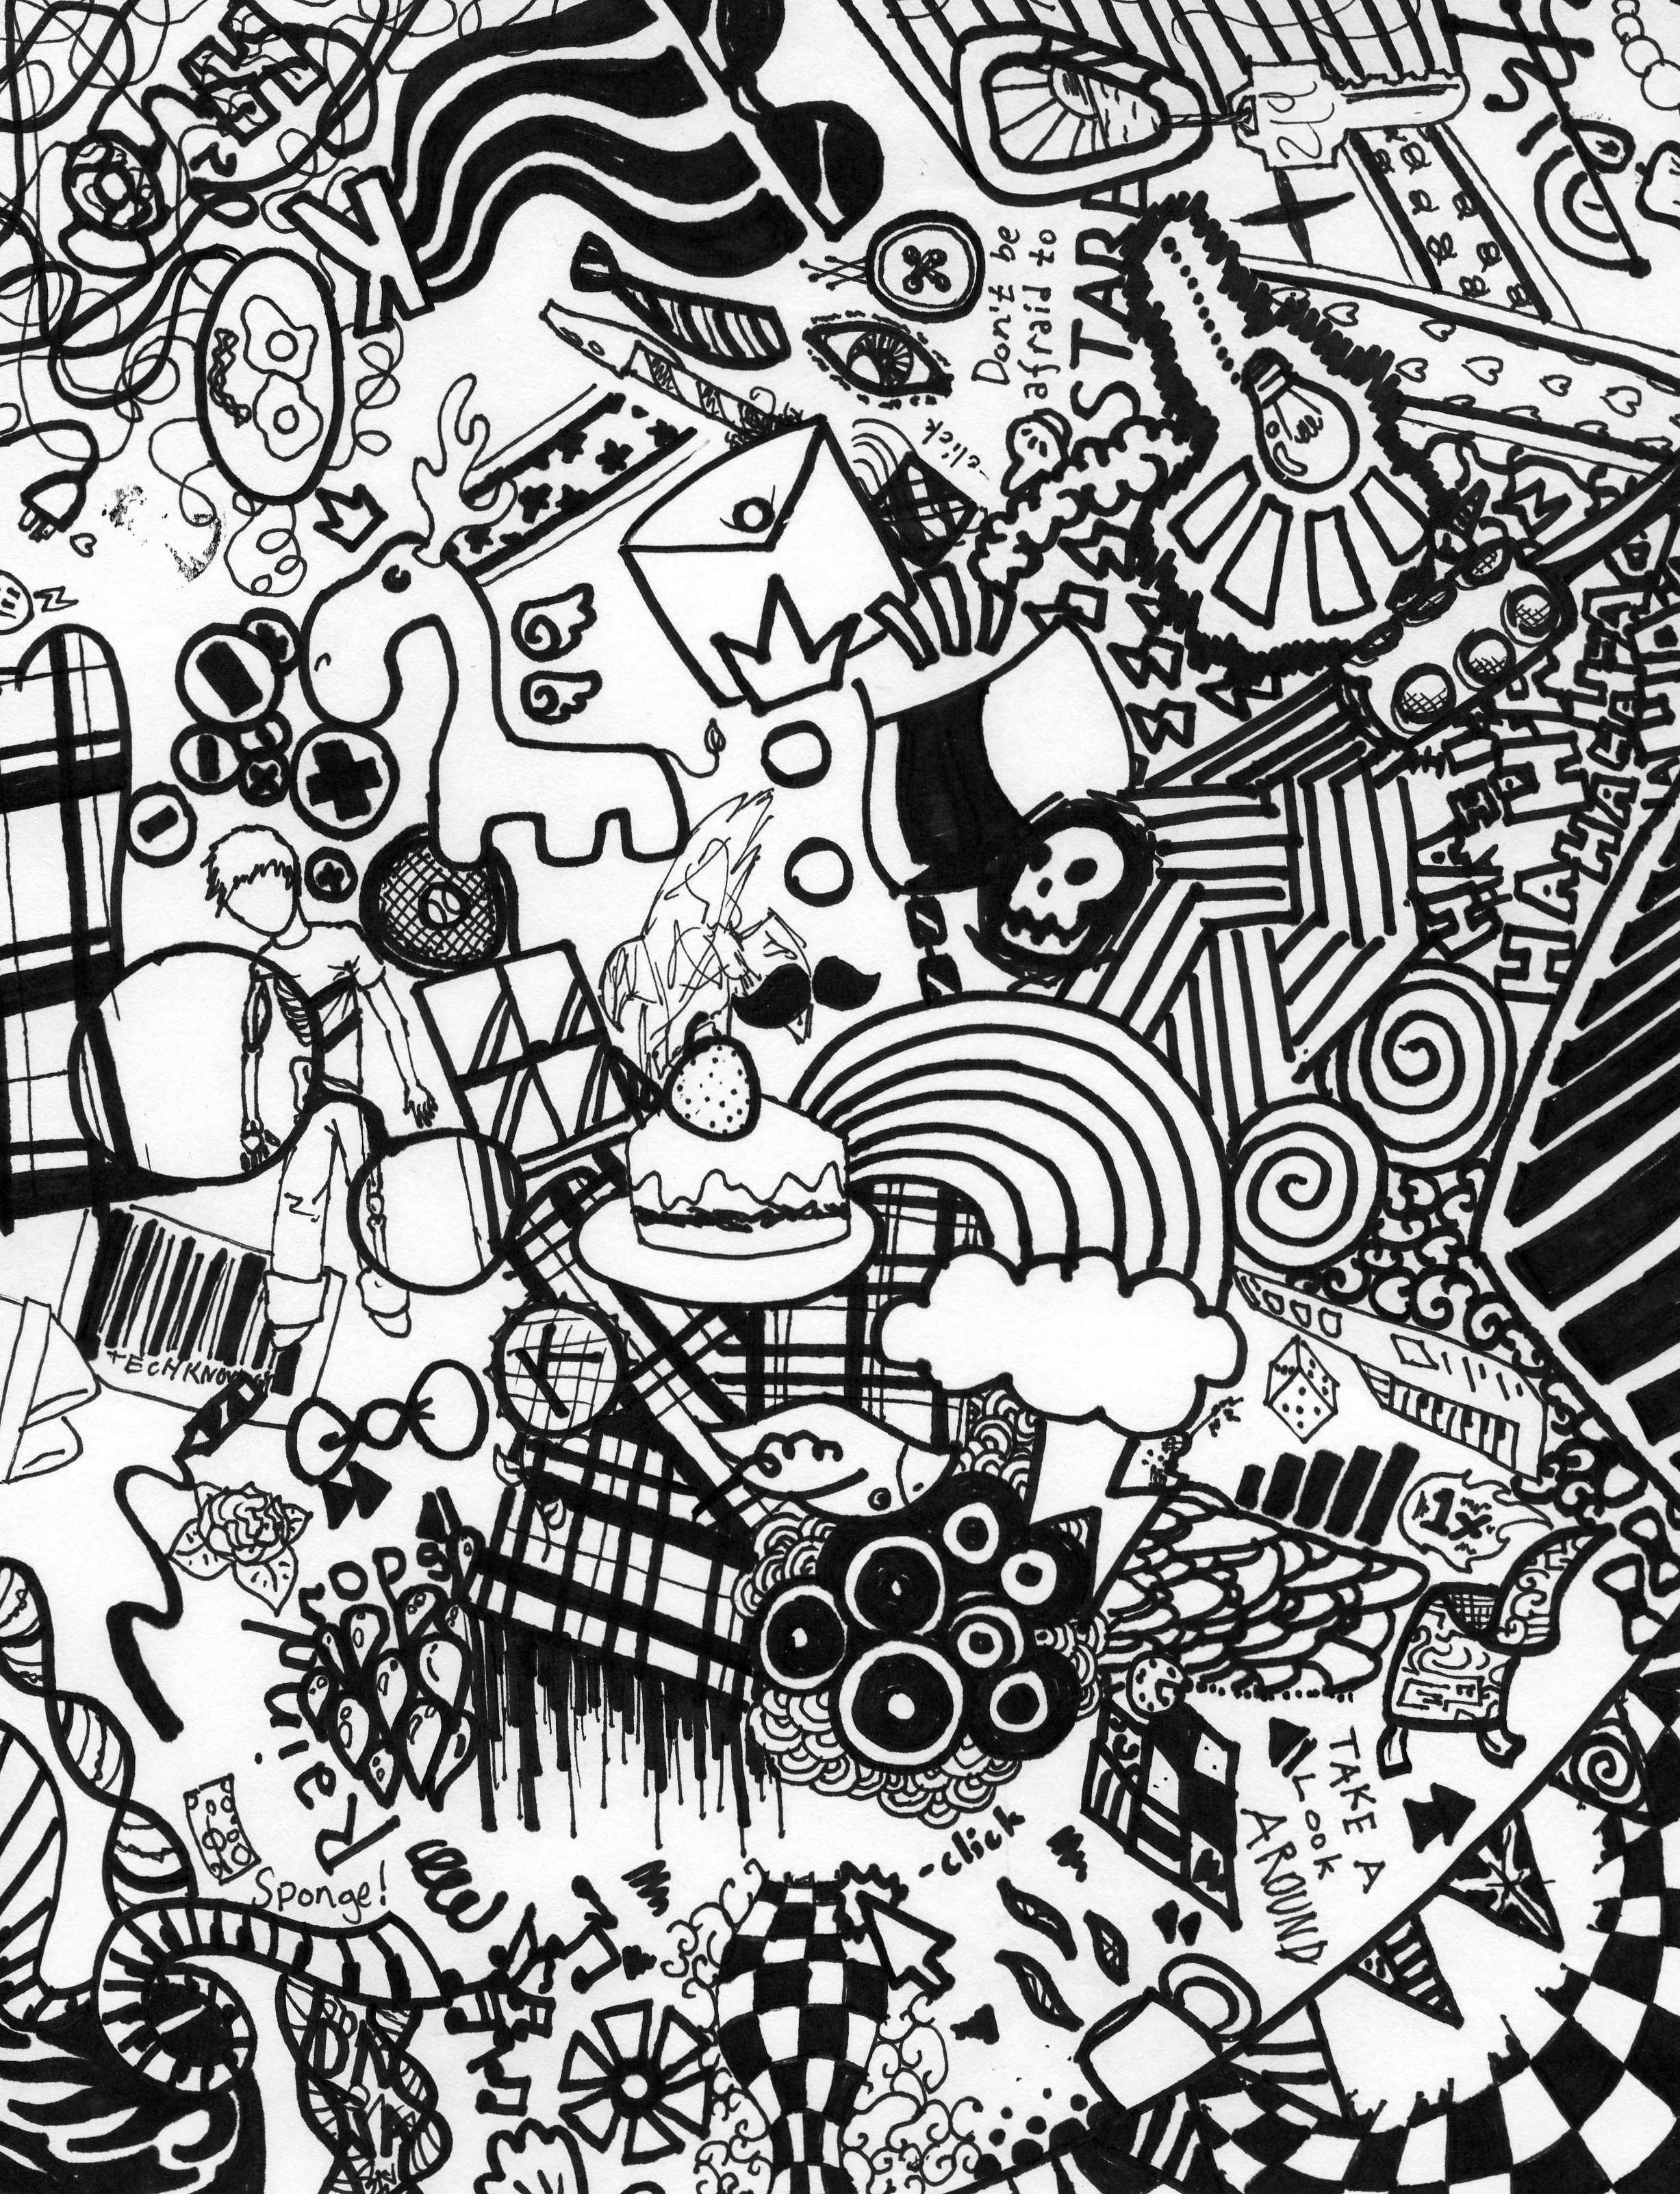 Doodle Art Designs : Sharpie doodle art intricate arts pinterest